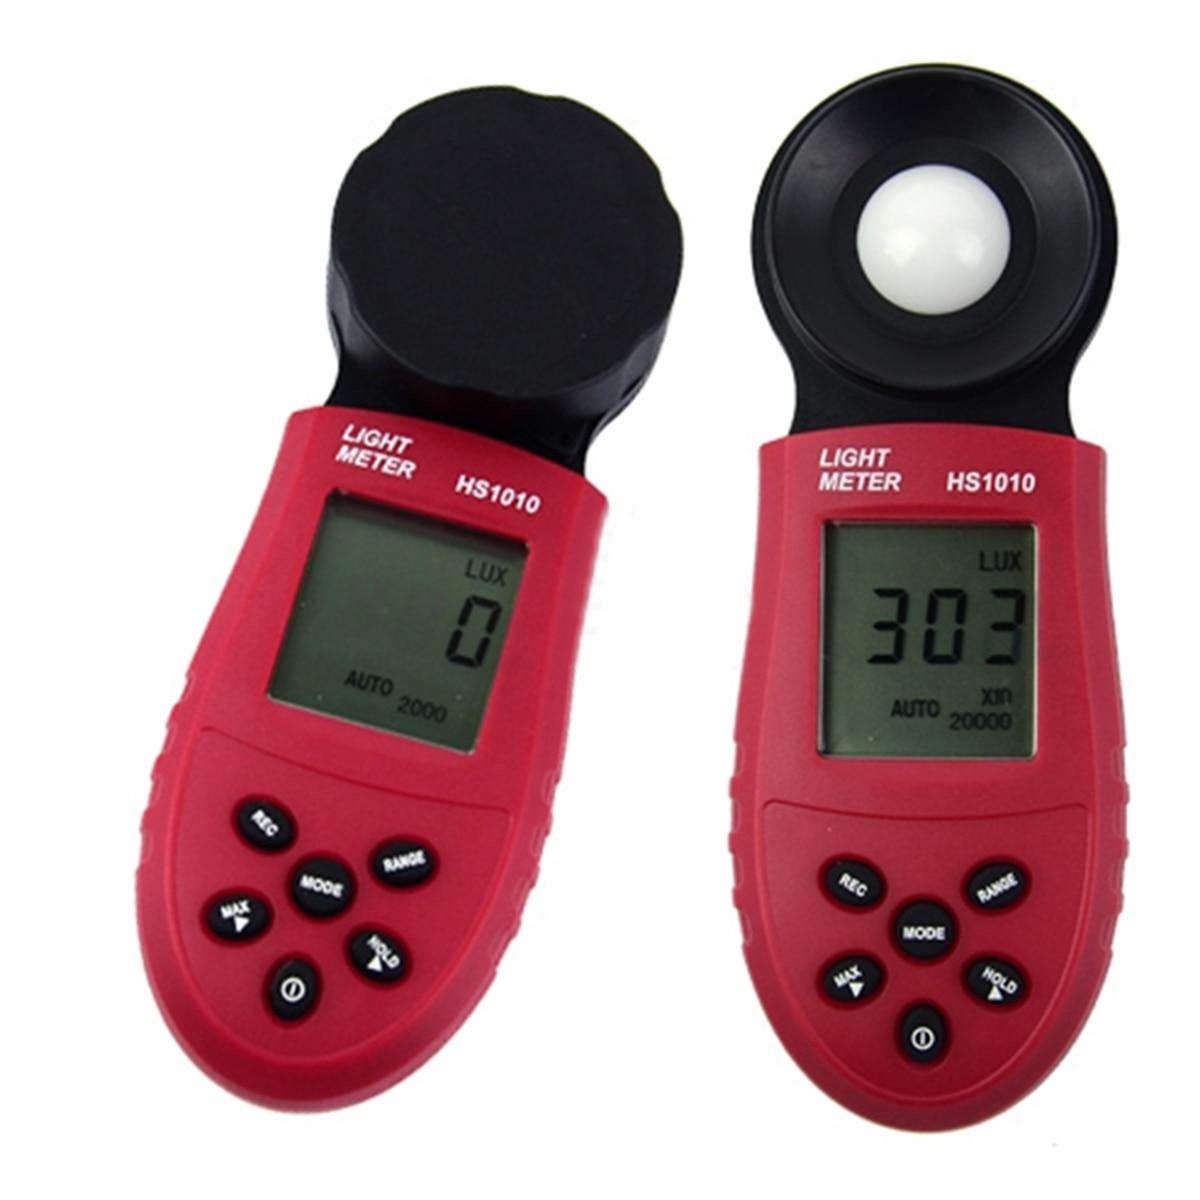 Business & Industrial Test, Measure & Inspect PEAKMETER LED ...